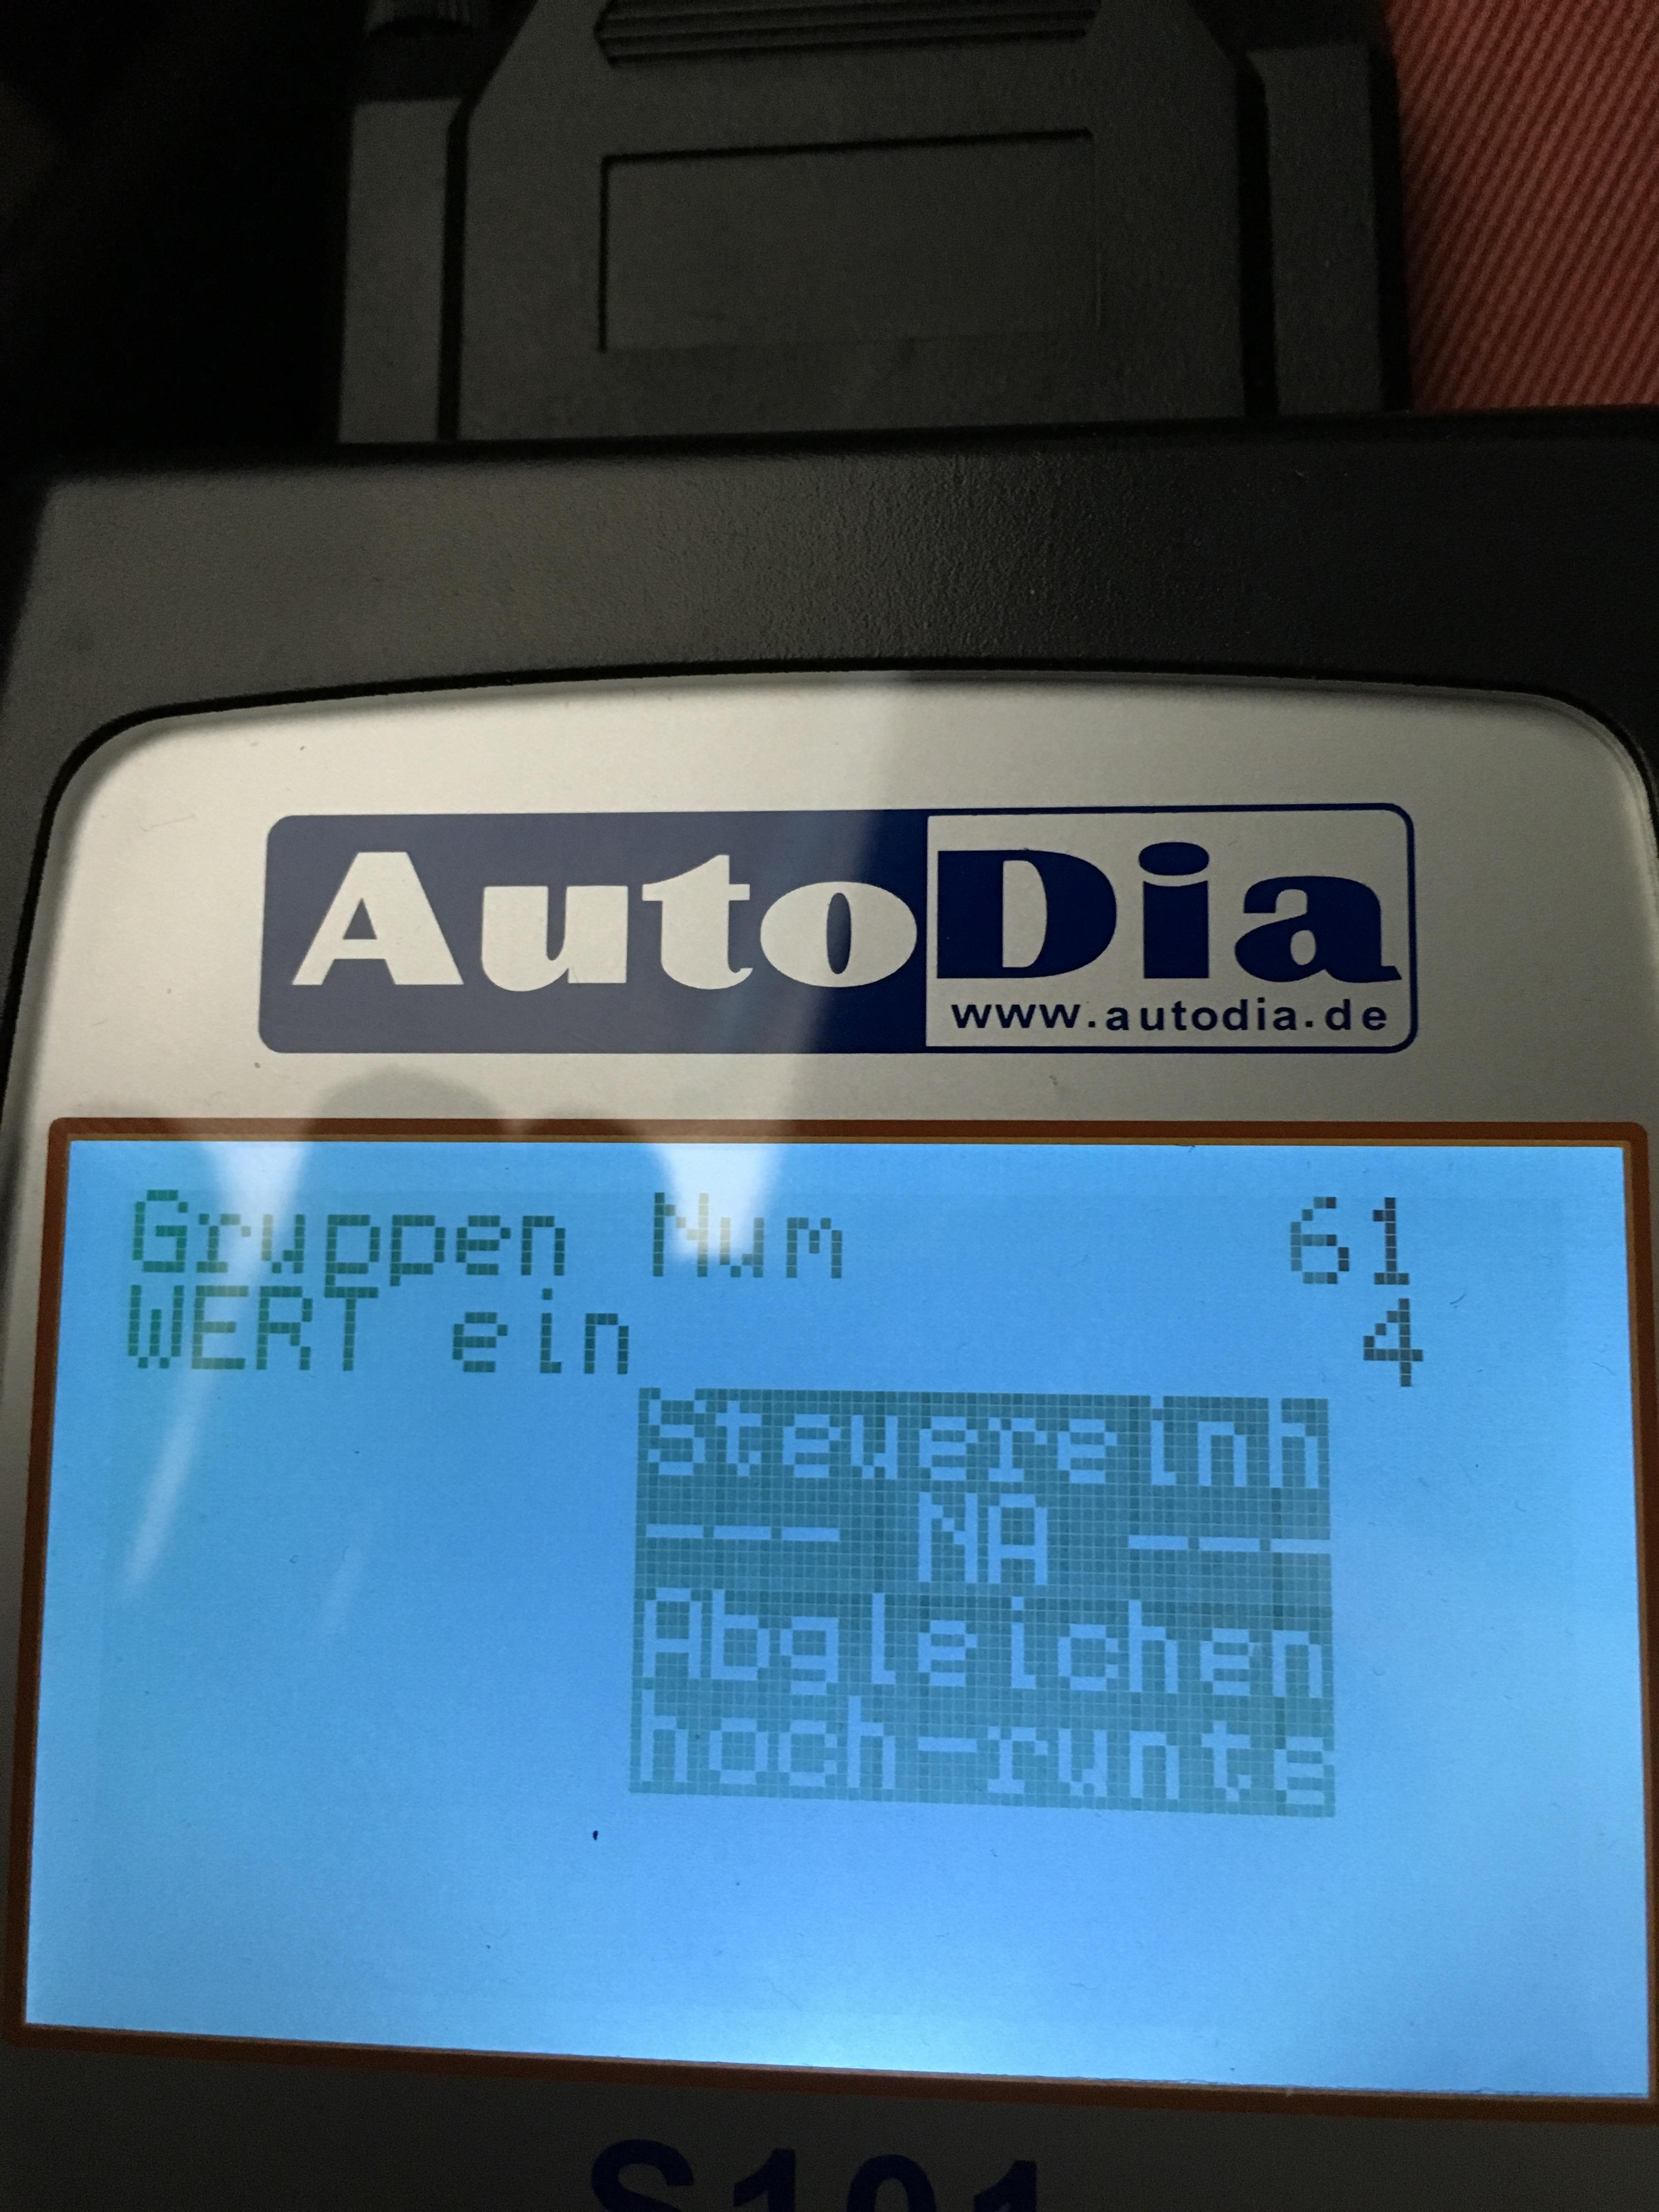 58934469552a8_Autodiag-2.jpg.f2a17f1c4fe0c8f806f96f85030684aa.jpg